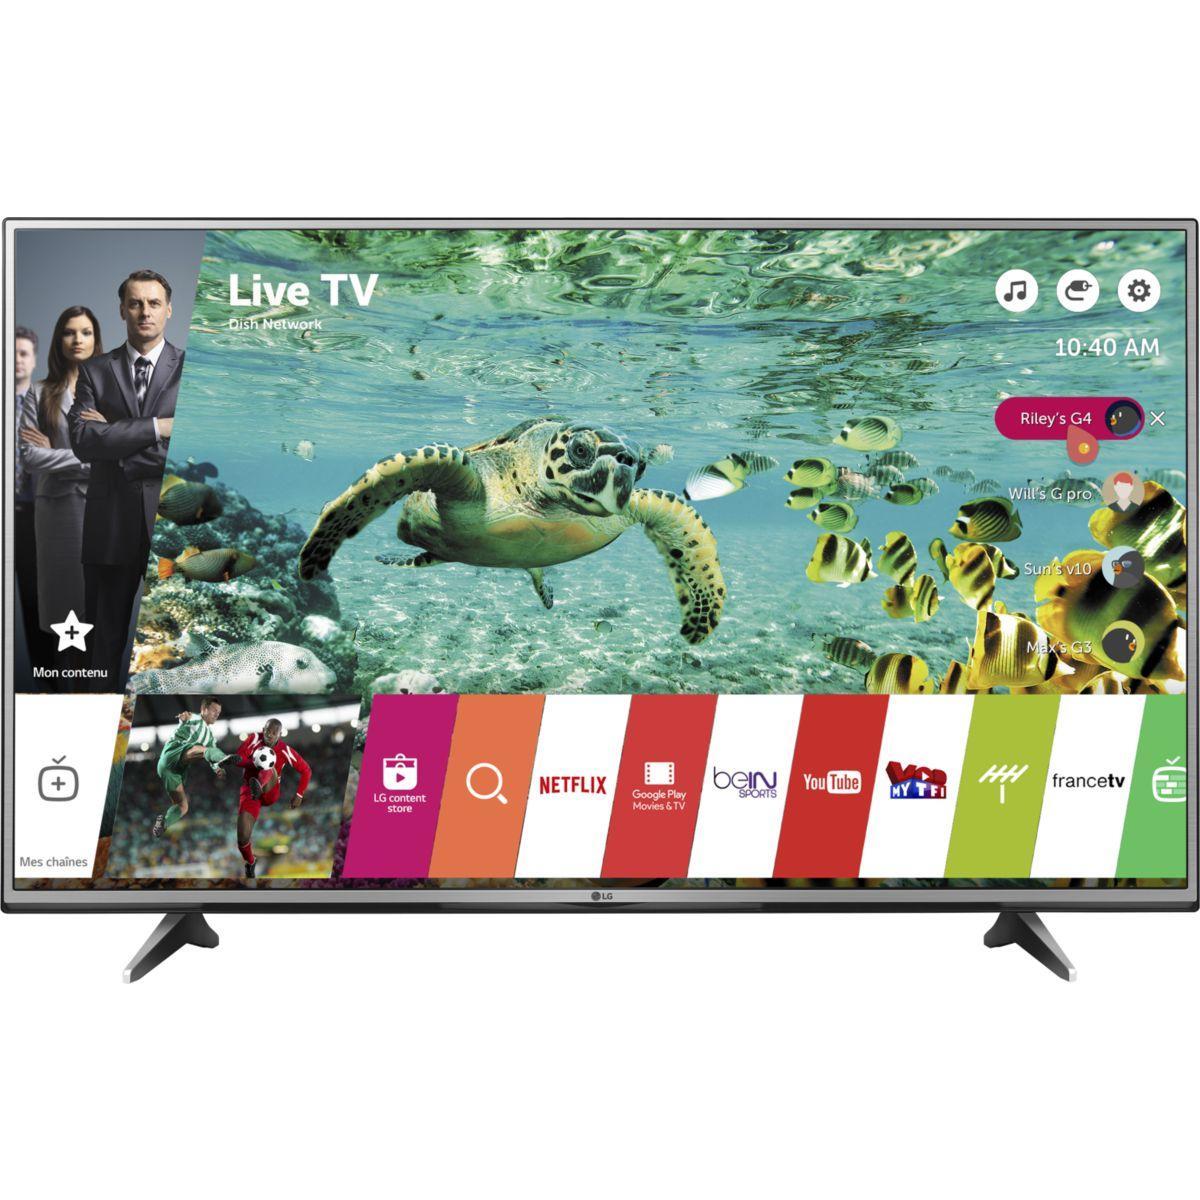 TV LG 55UH615V 4K HDR 1200 PMI SMART TV